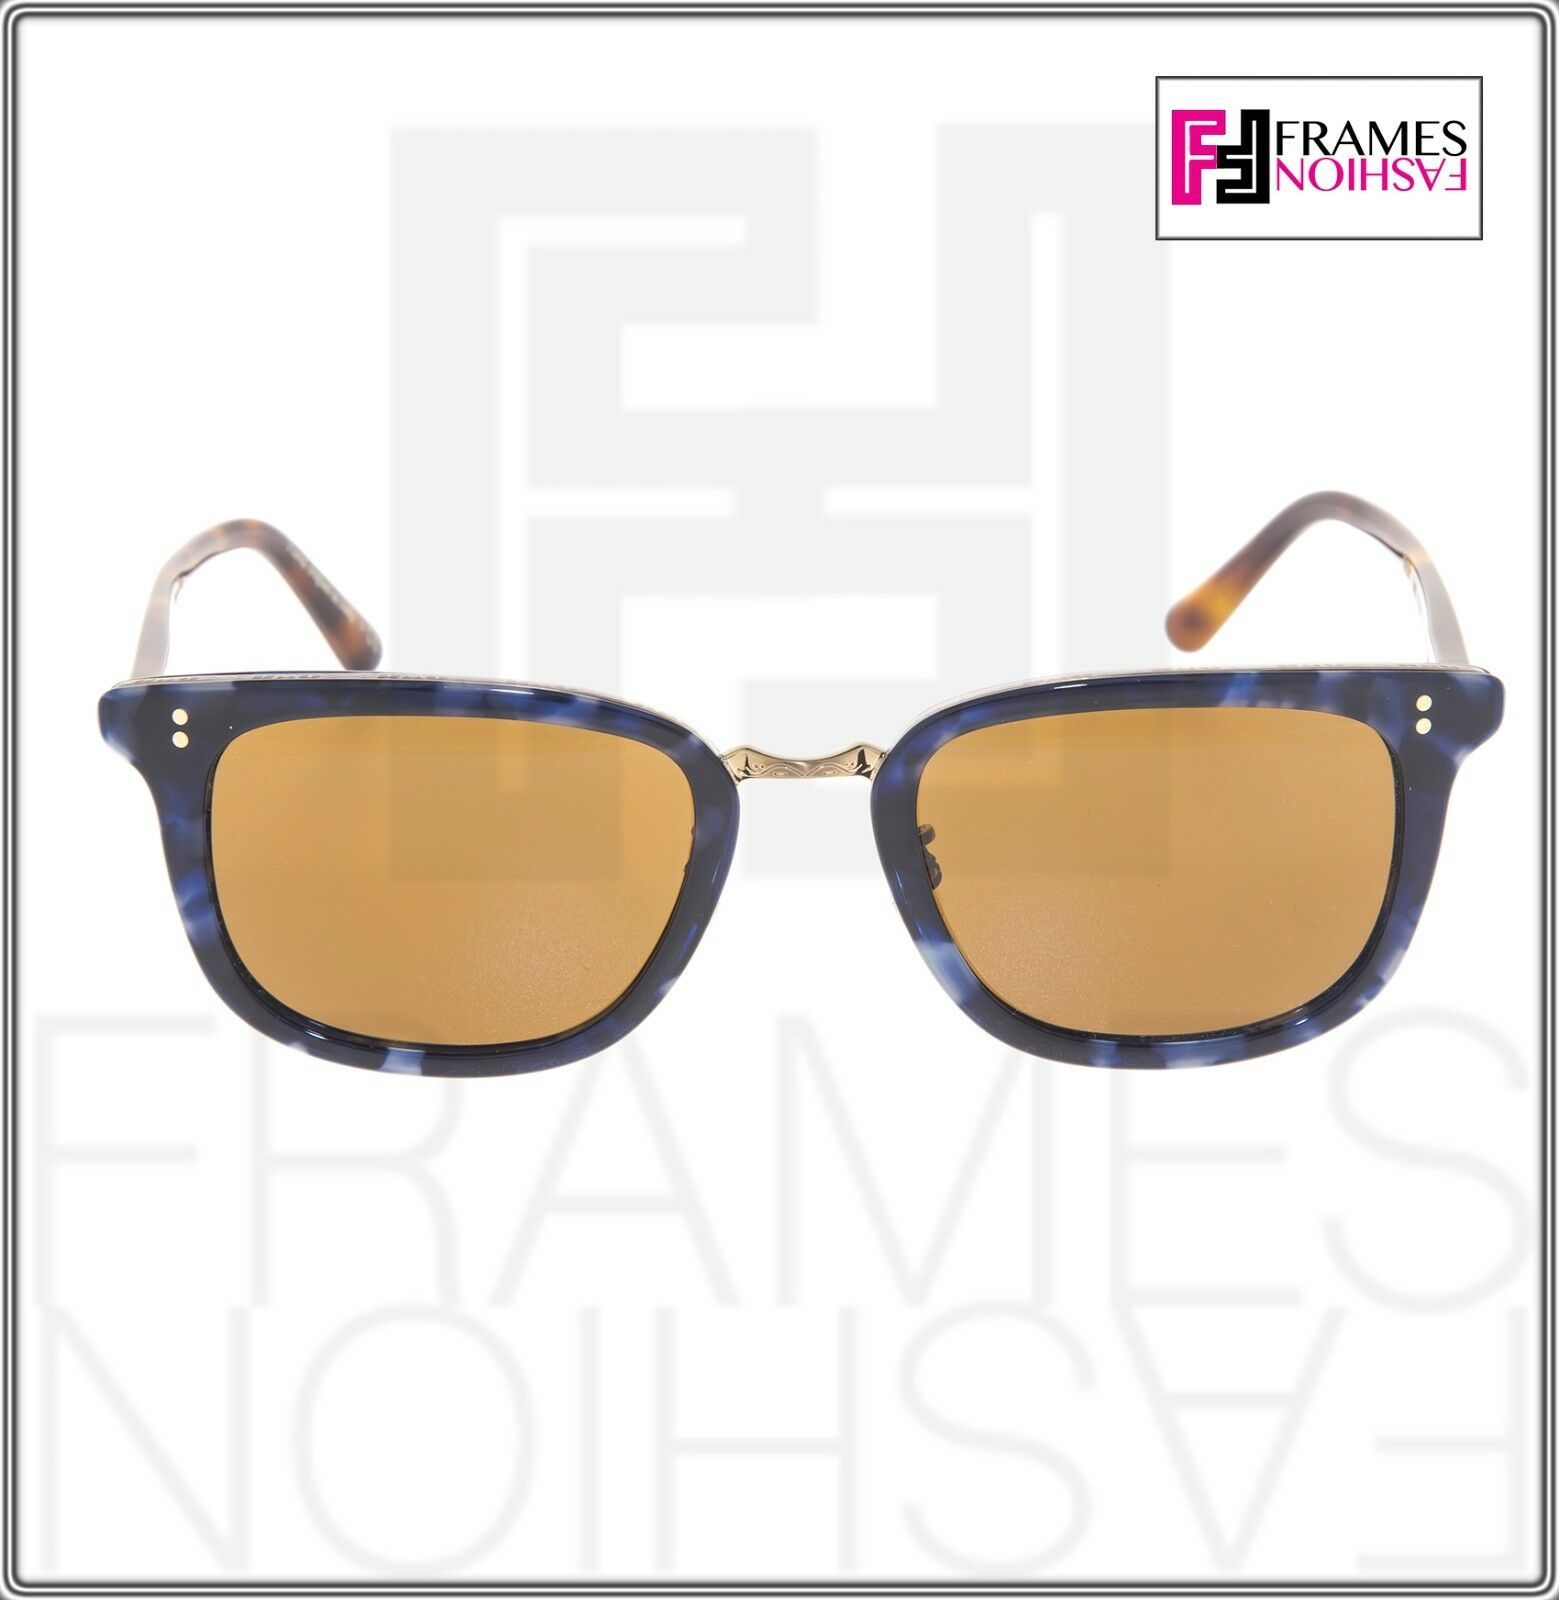 OLIVER PEOPLES KETTNER OV5339S Brown Blue Tortoise Cosmik Sunglasses 5339 image 6